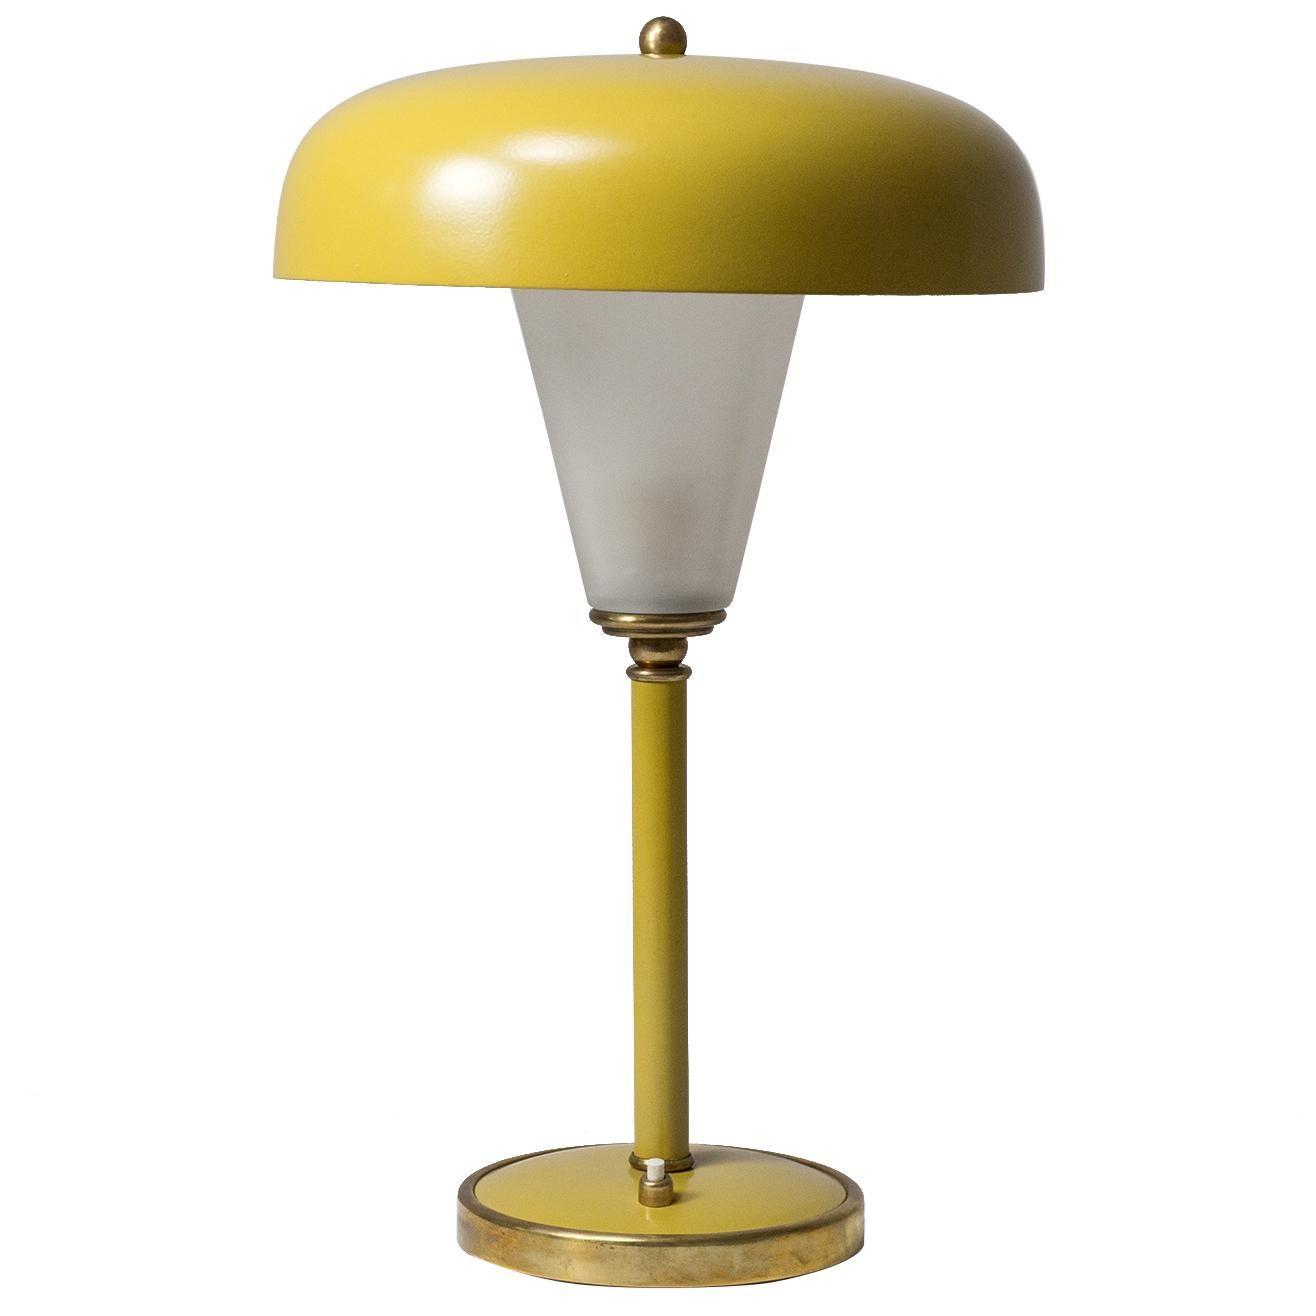 French Art Deco Lantern Table Lamp 1940s Art Deco Lanterns Lantern Table Lamp Glass Diffuser